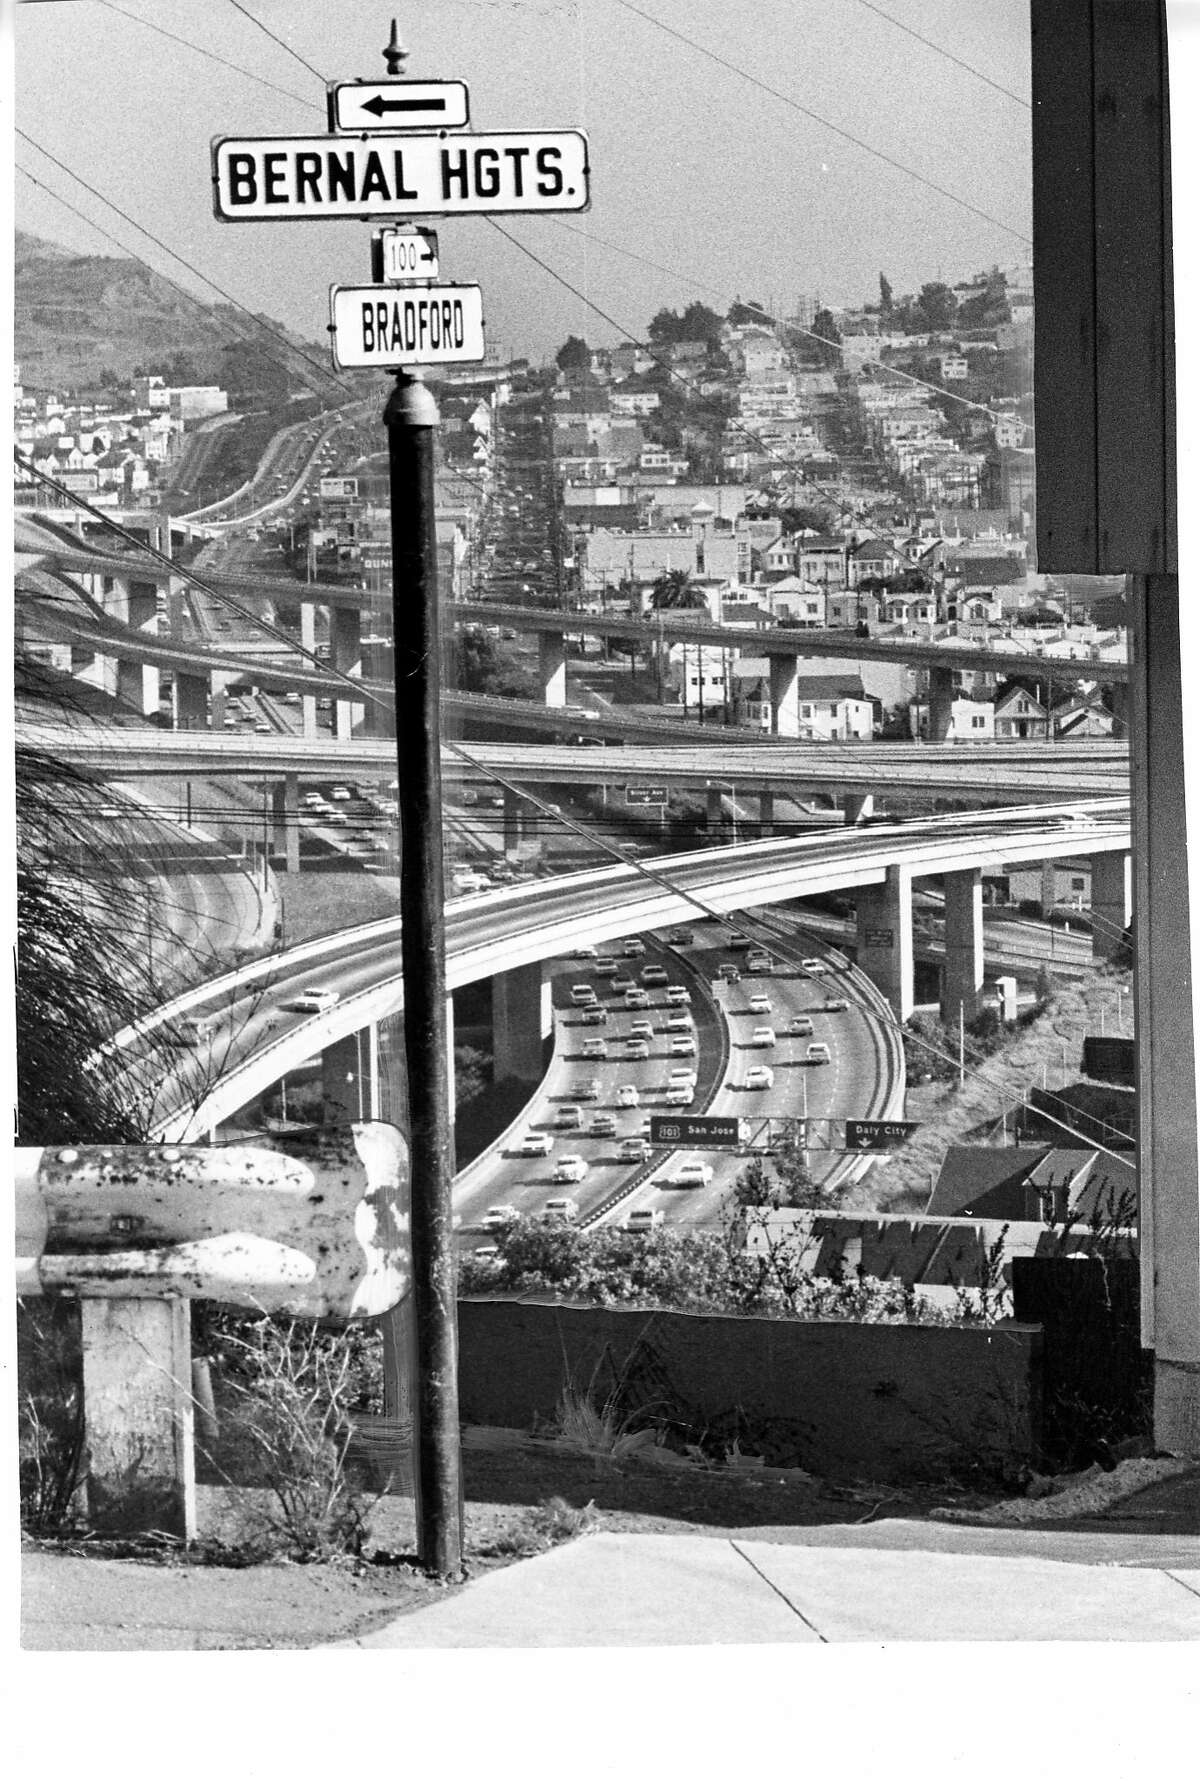 Bradford Street overlooking the 101 freeway on Bernal Heights in San Francisco, Photo ran 08/22/1966 Street names project